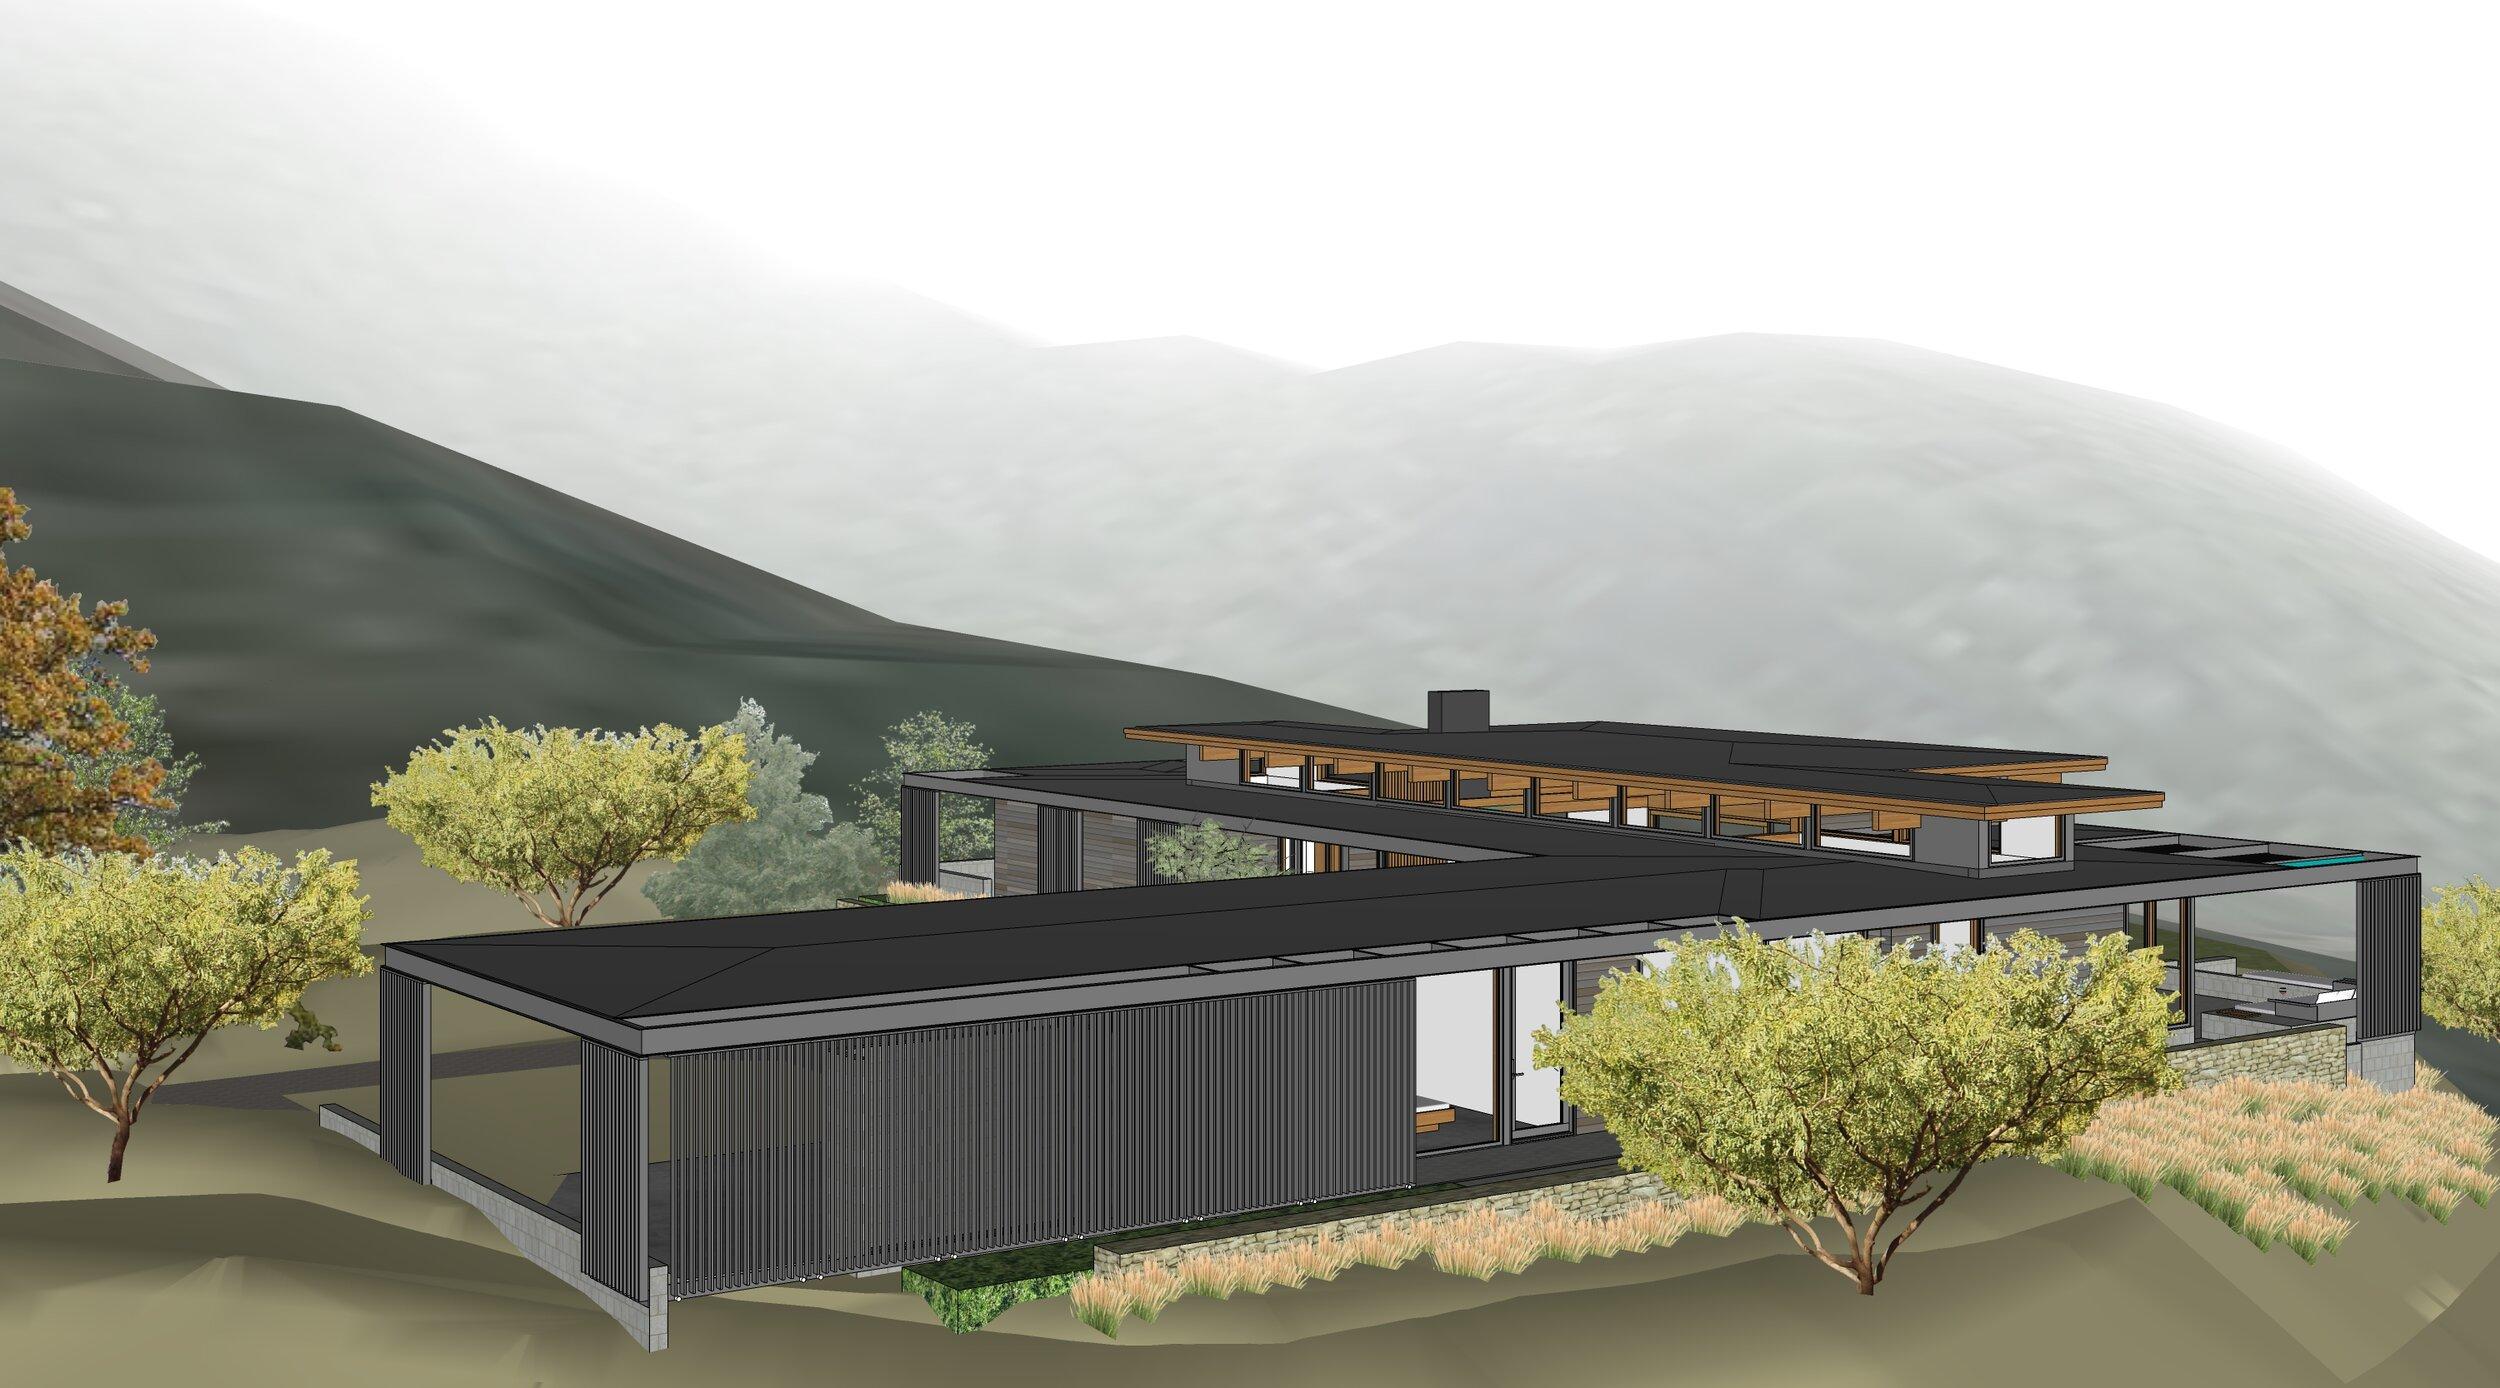 turkel_modern_design_prefab_custom_home_design_5.jpg